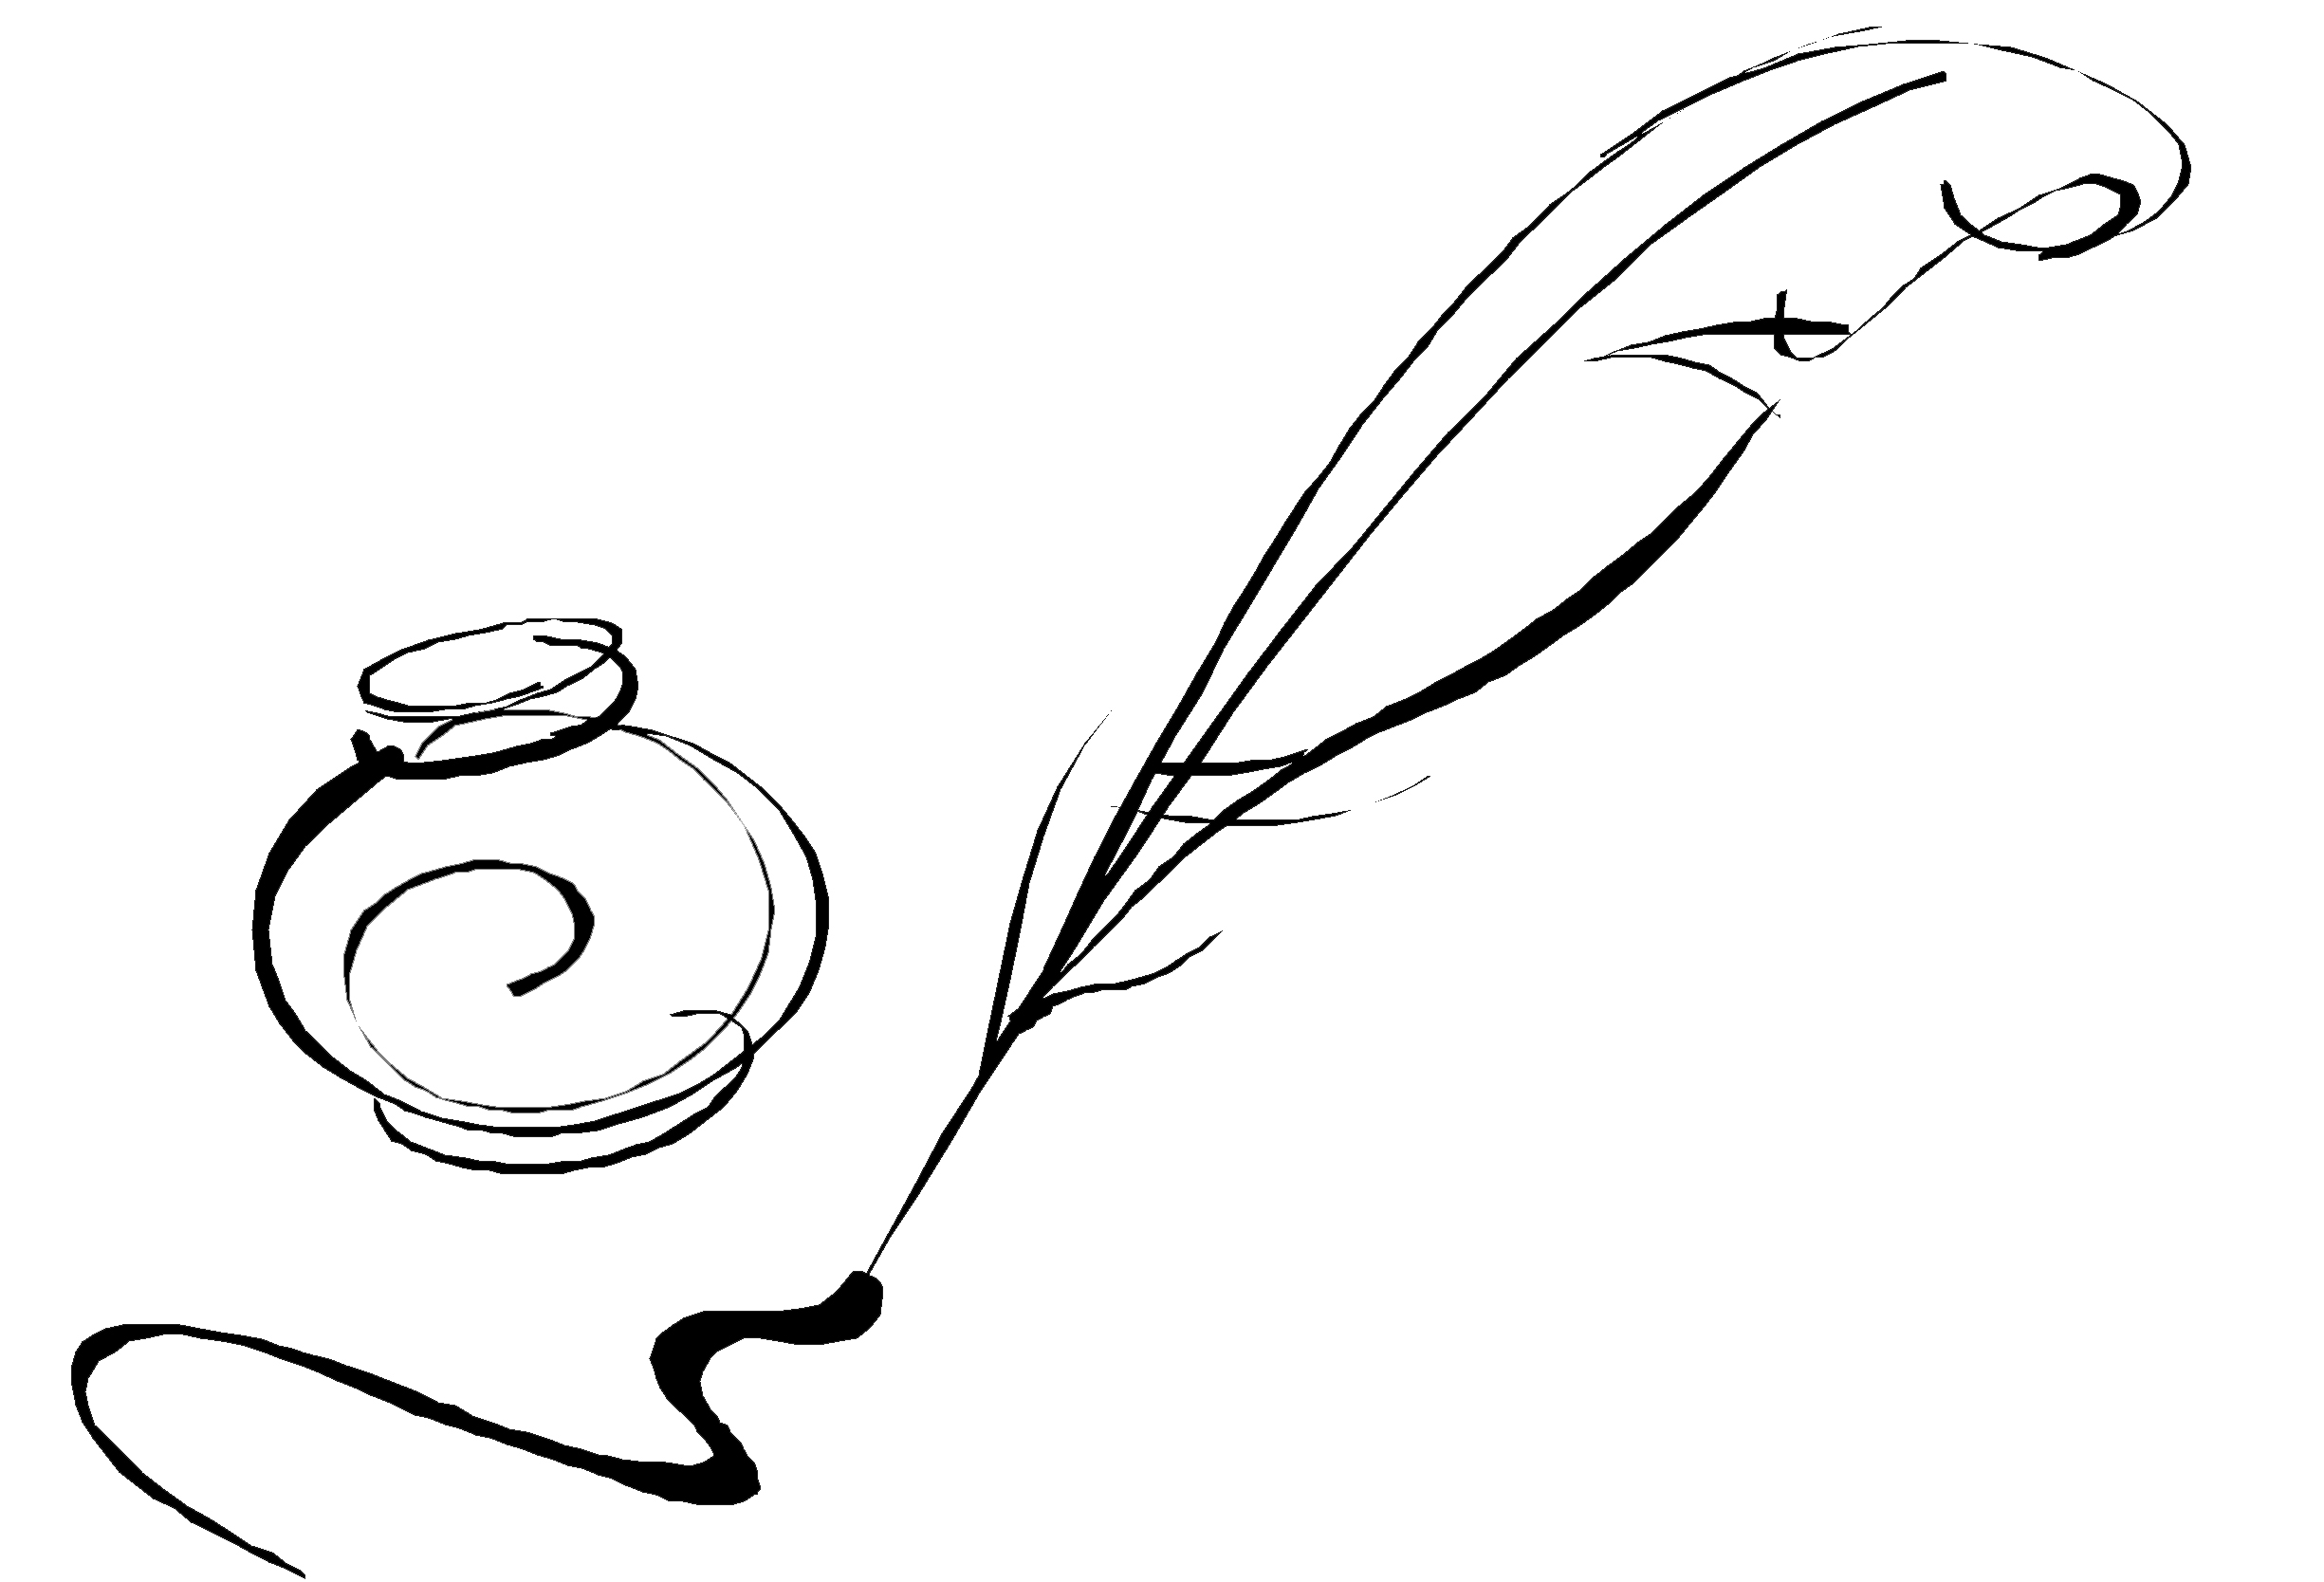 Drawn pen logo png Download Nawsheen Quill free images